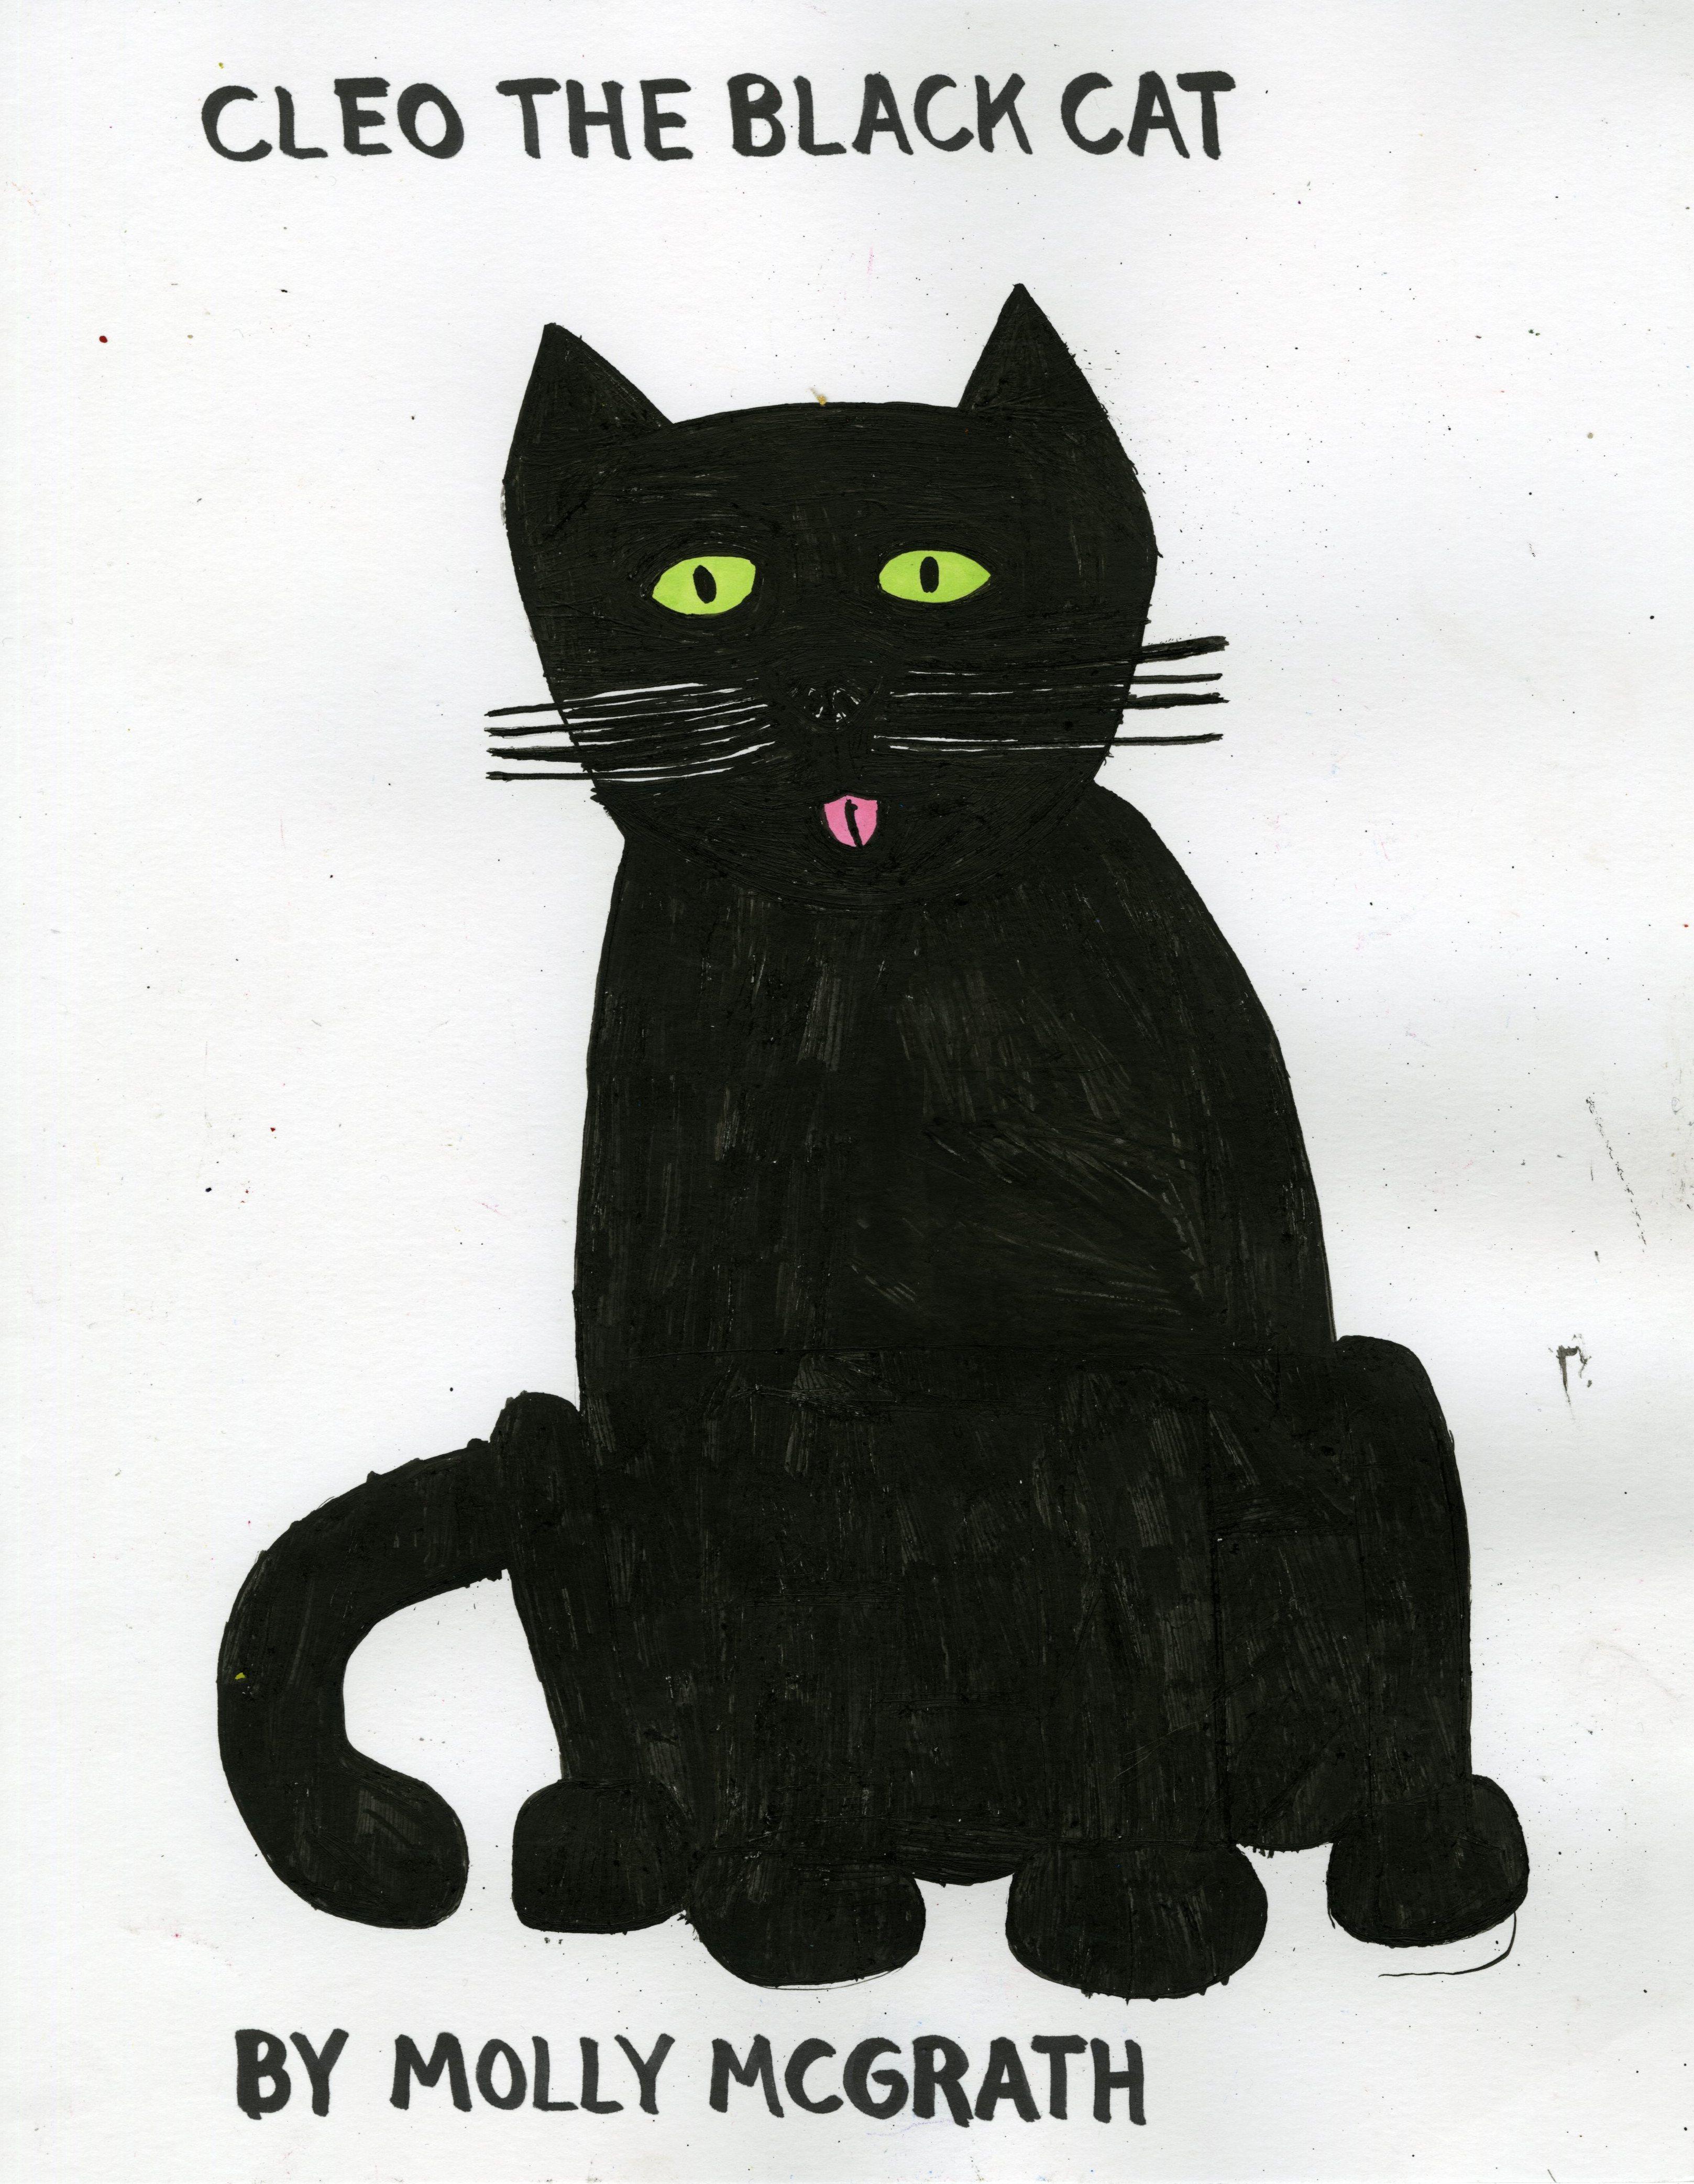 MM_Cleo the Black Cat305